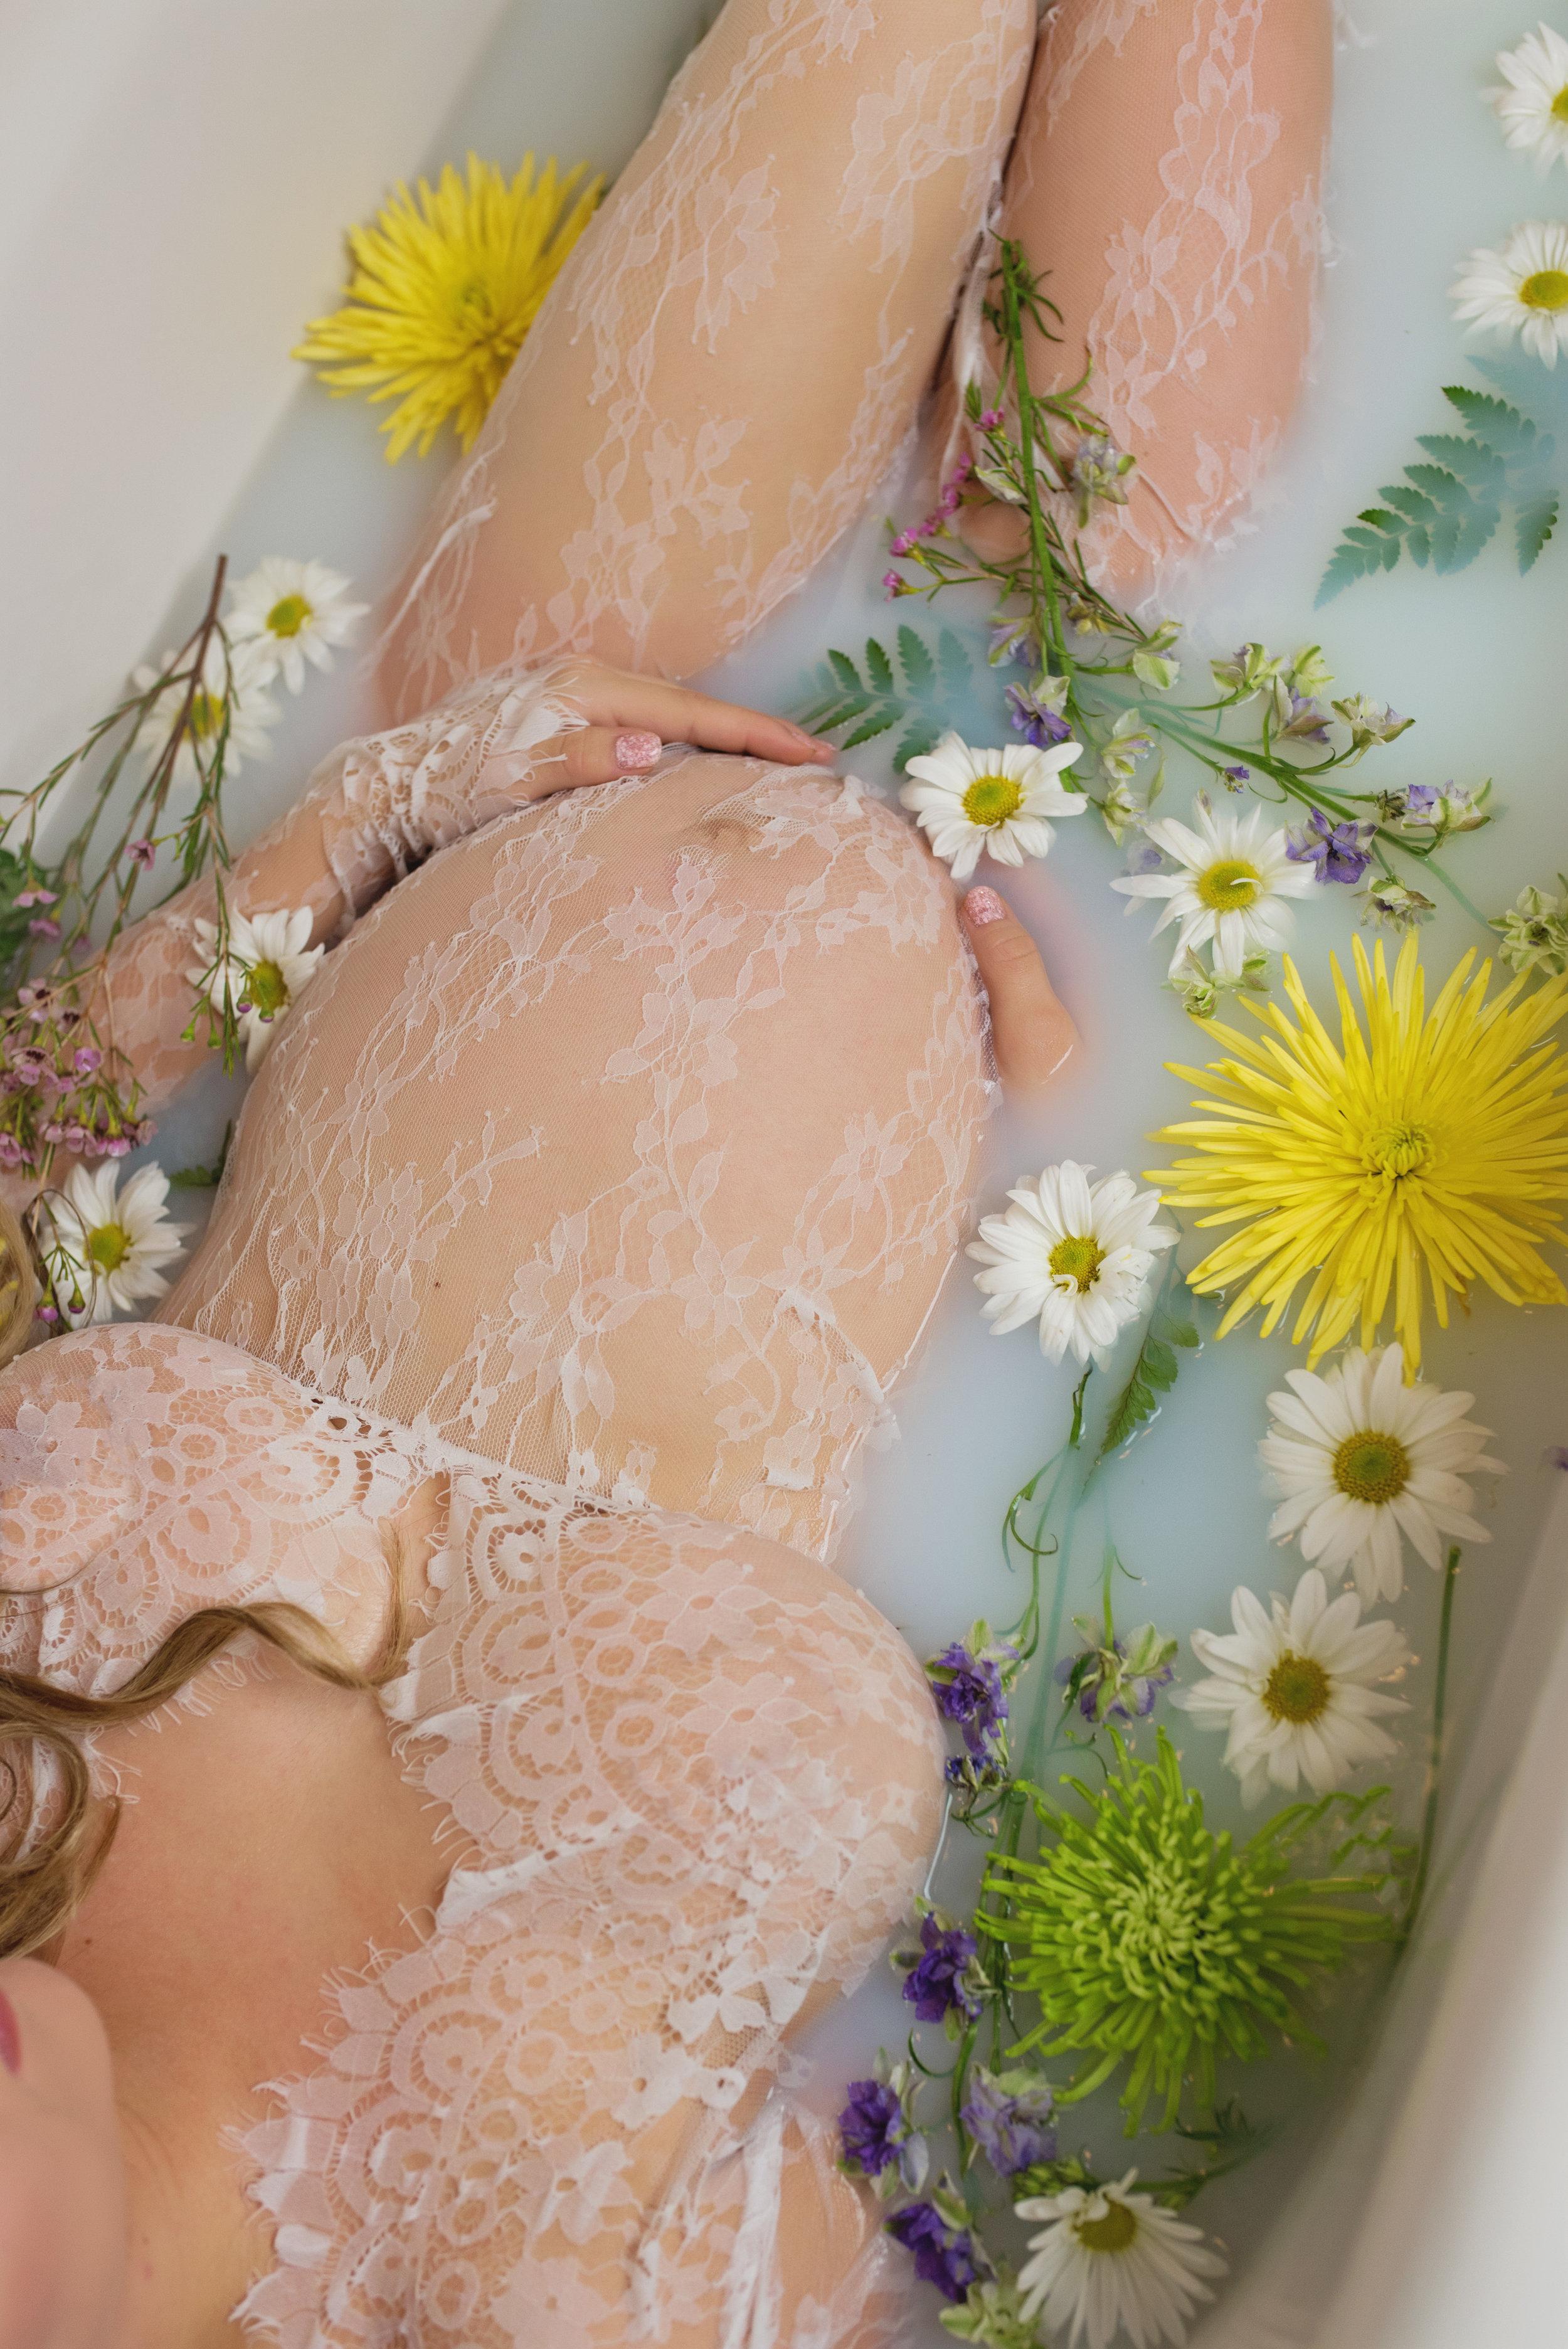 milk bath maternity photographer